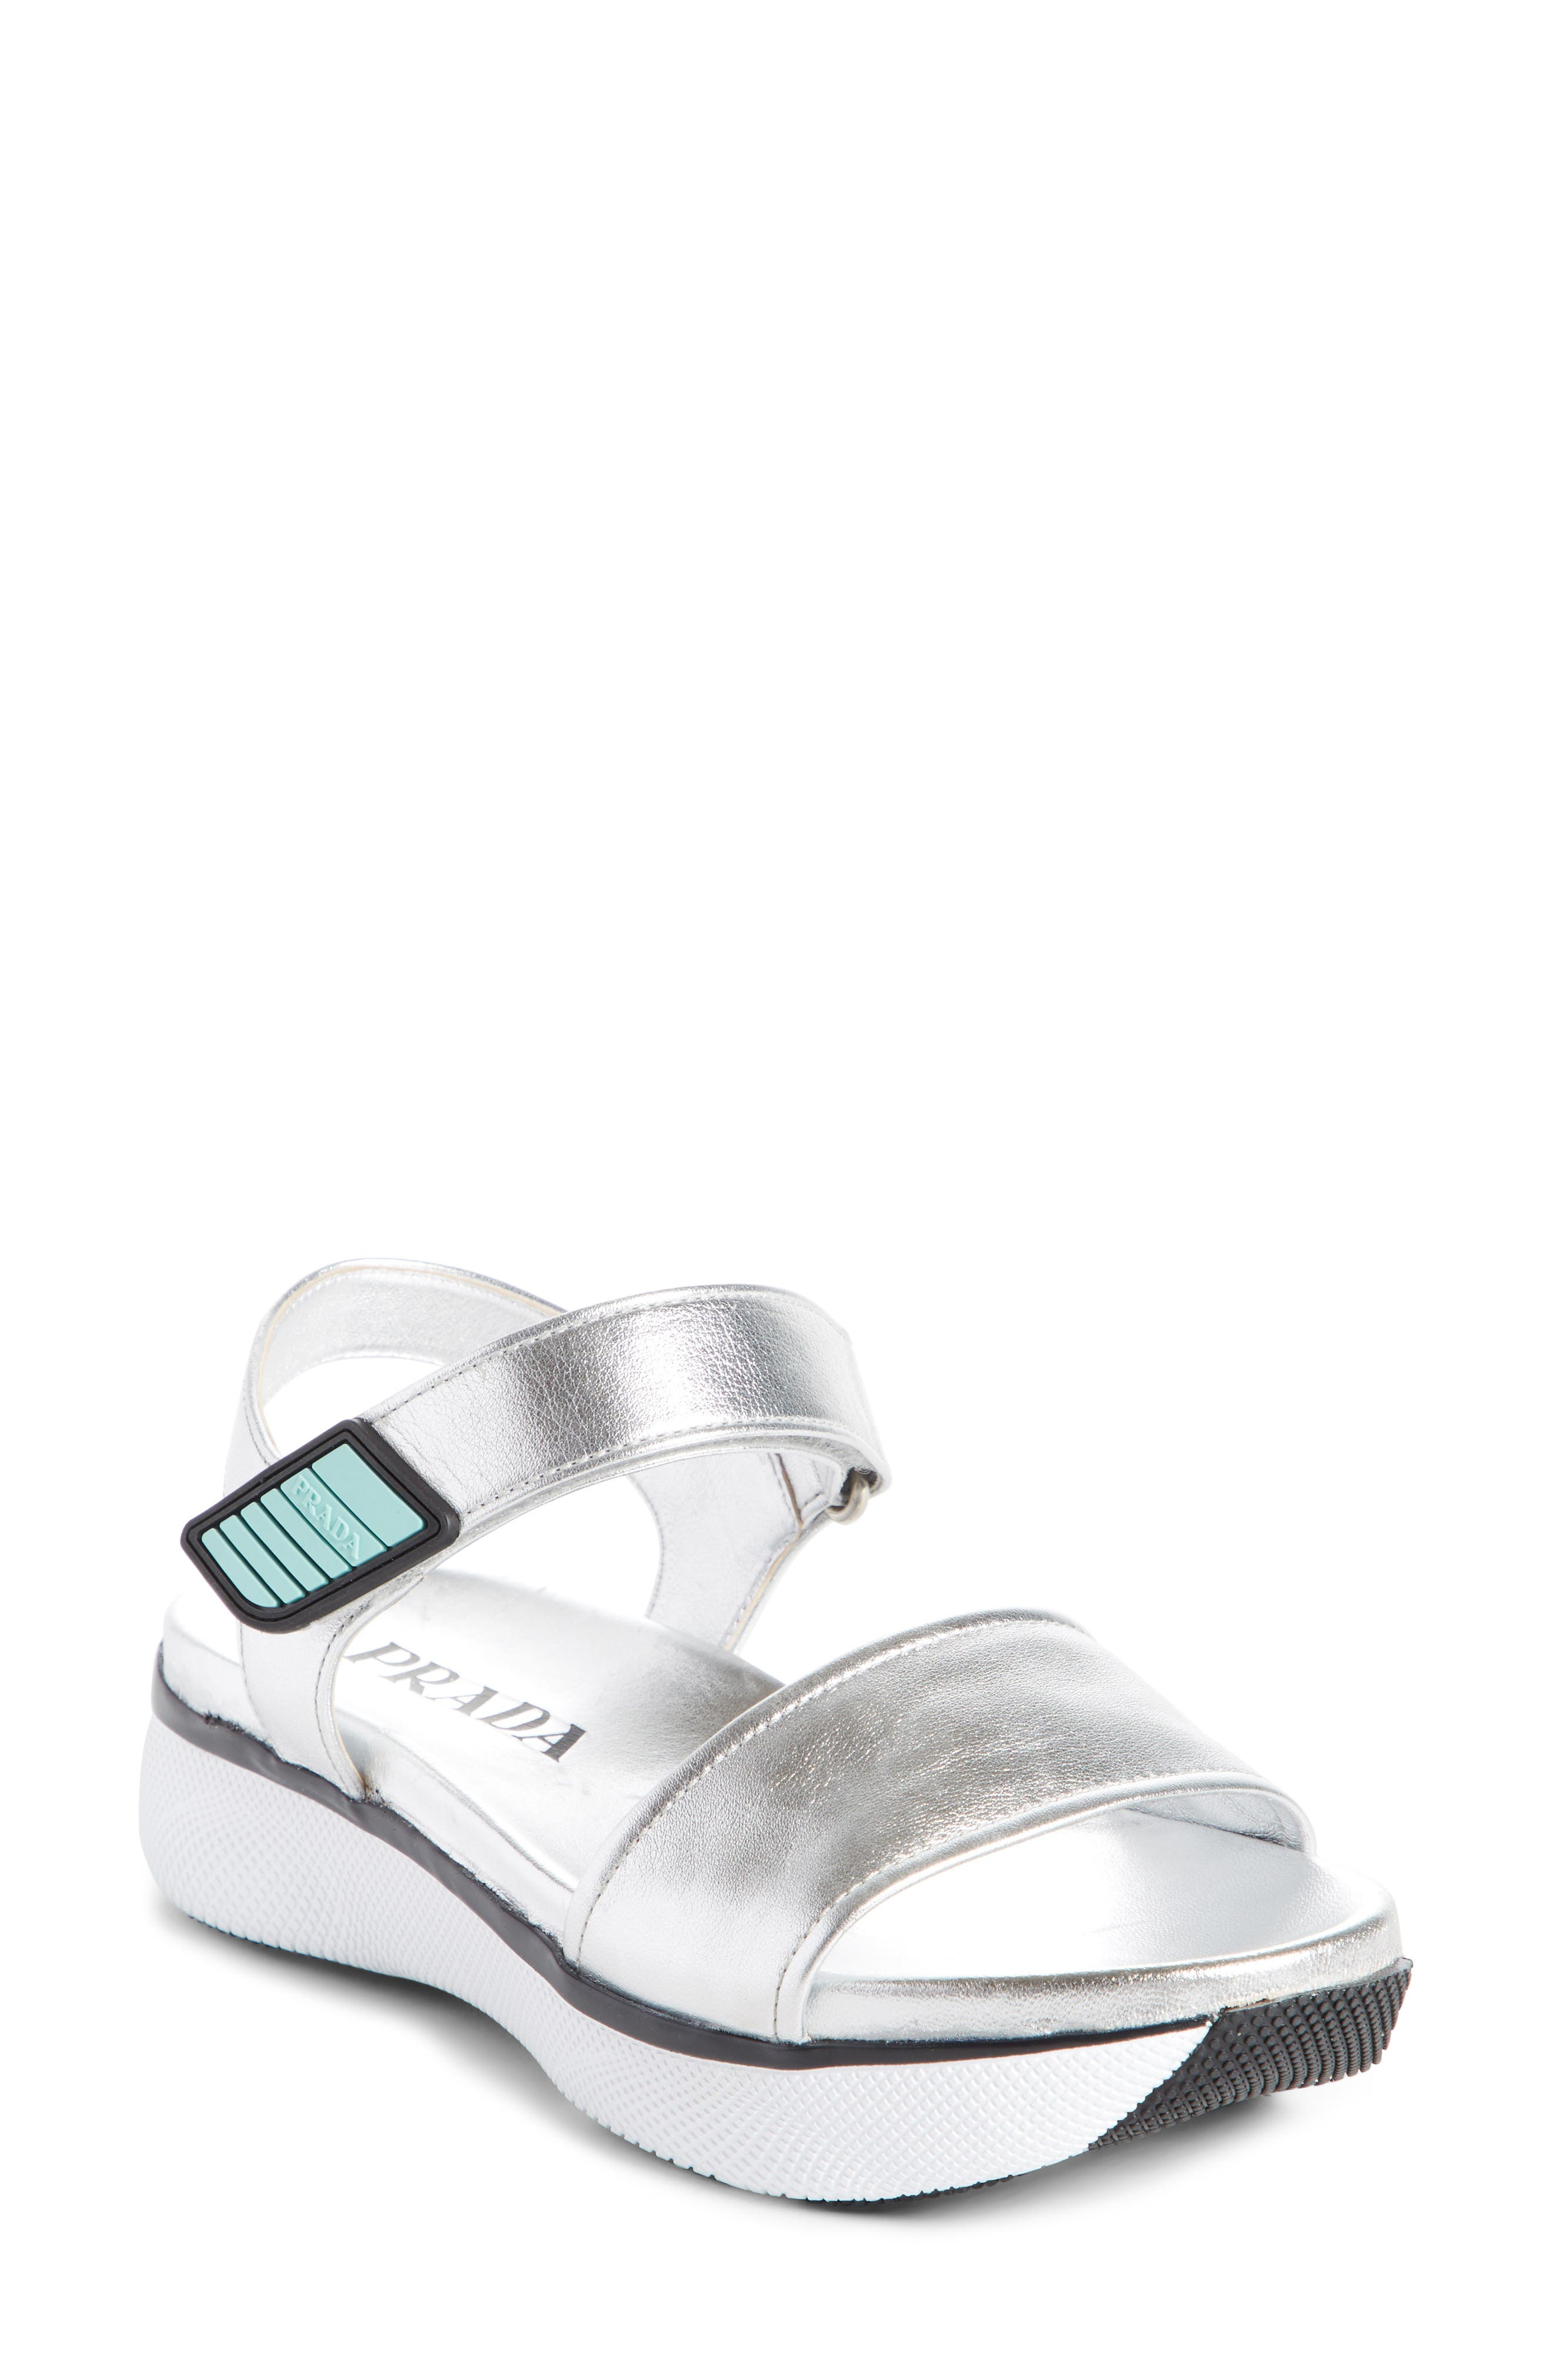 Platform Sandal,                         Main,                         color, Silver